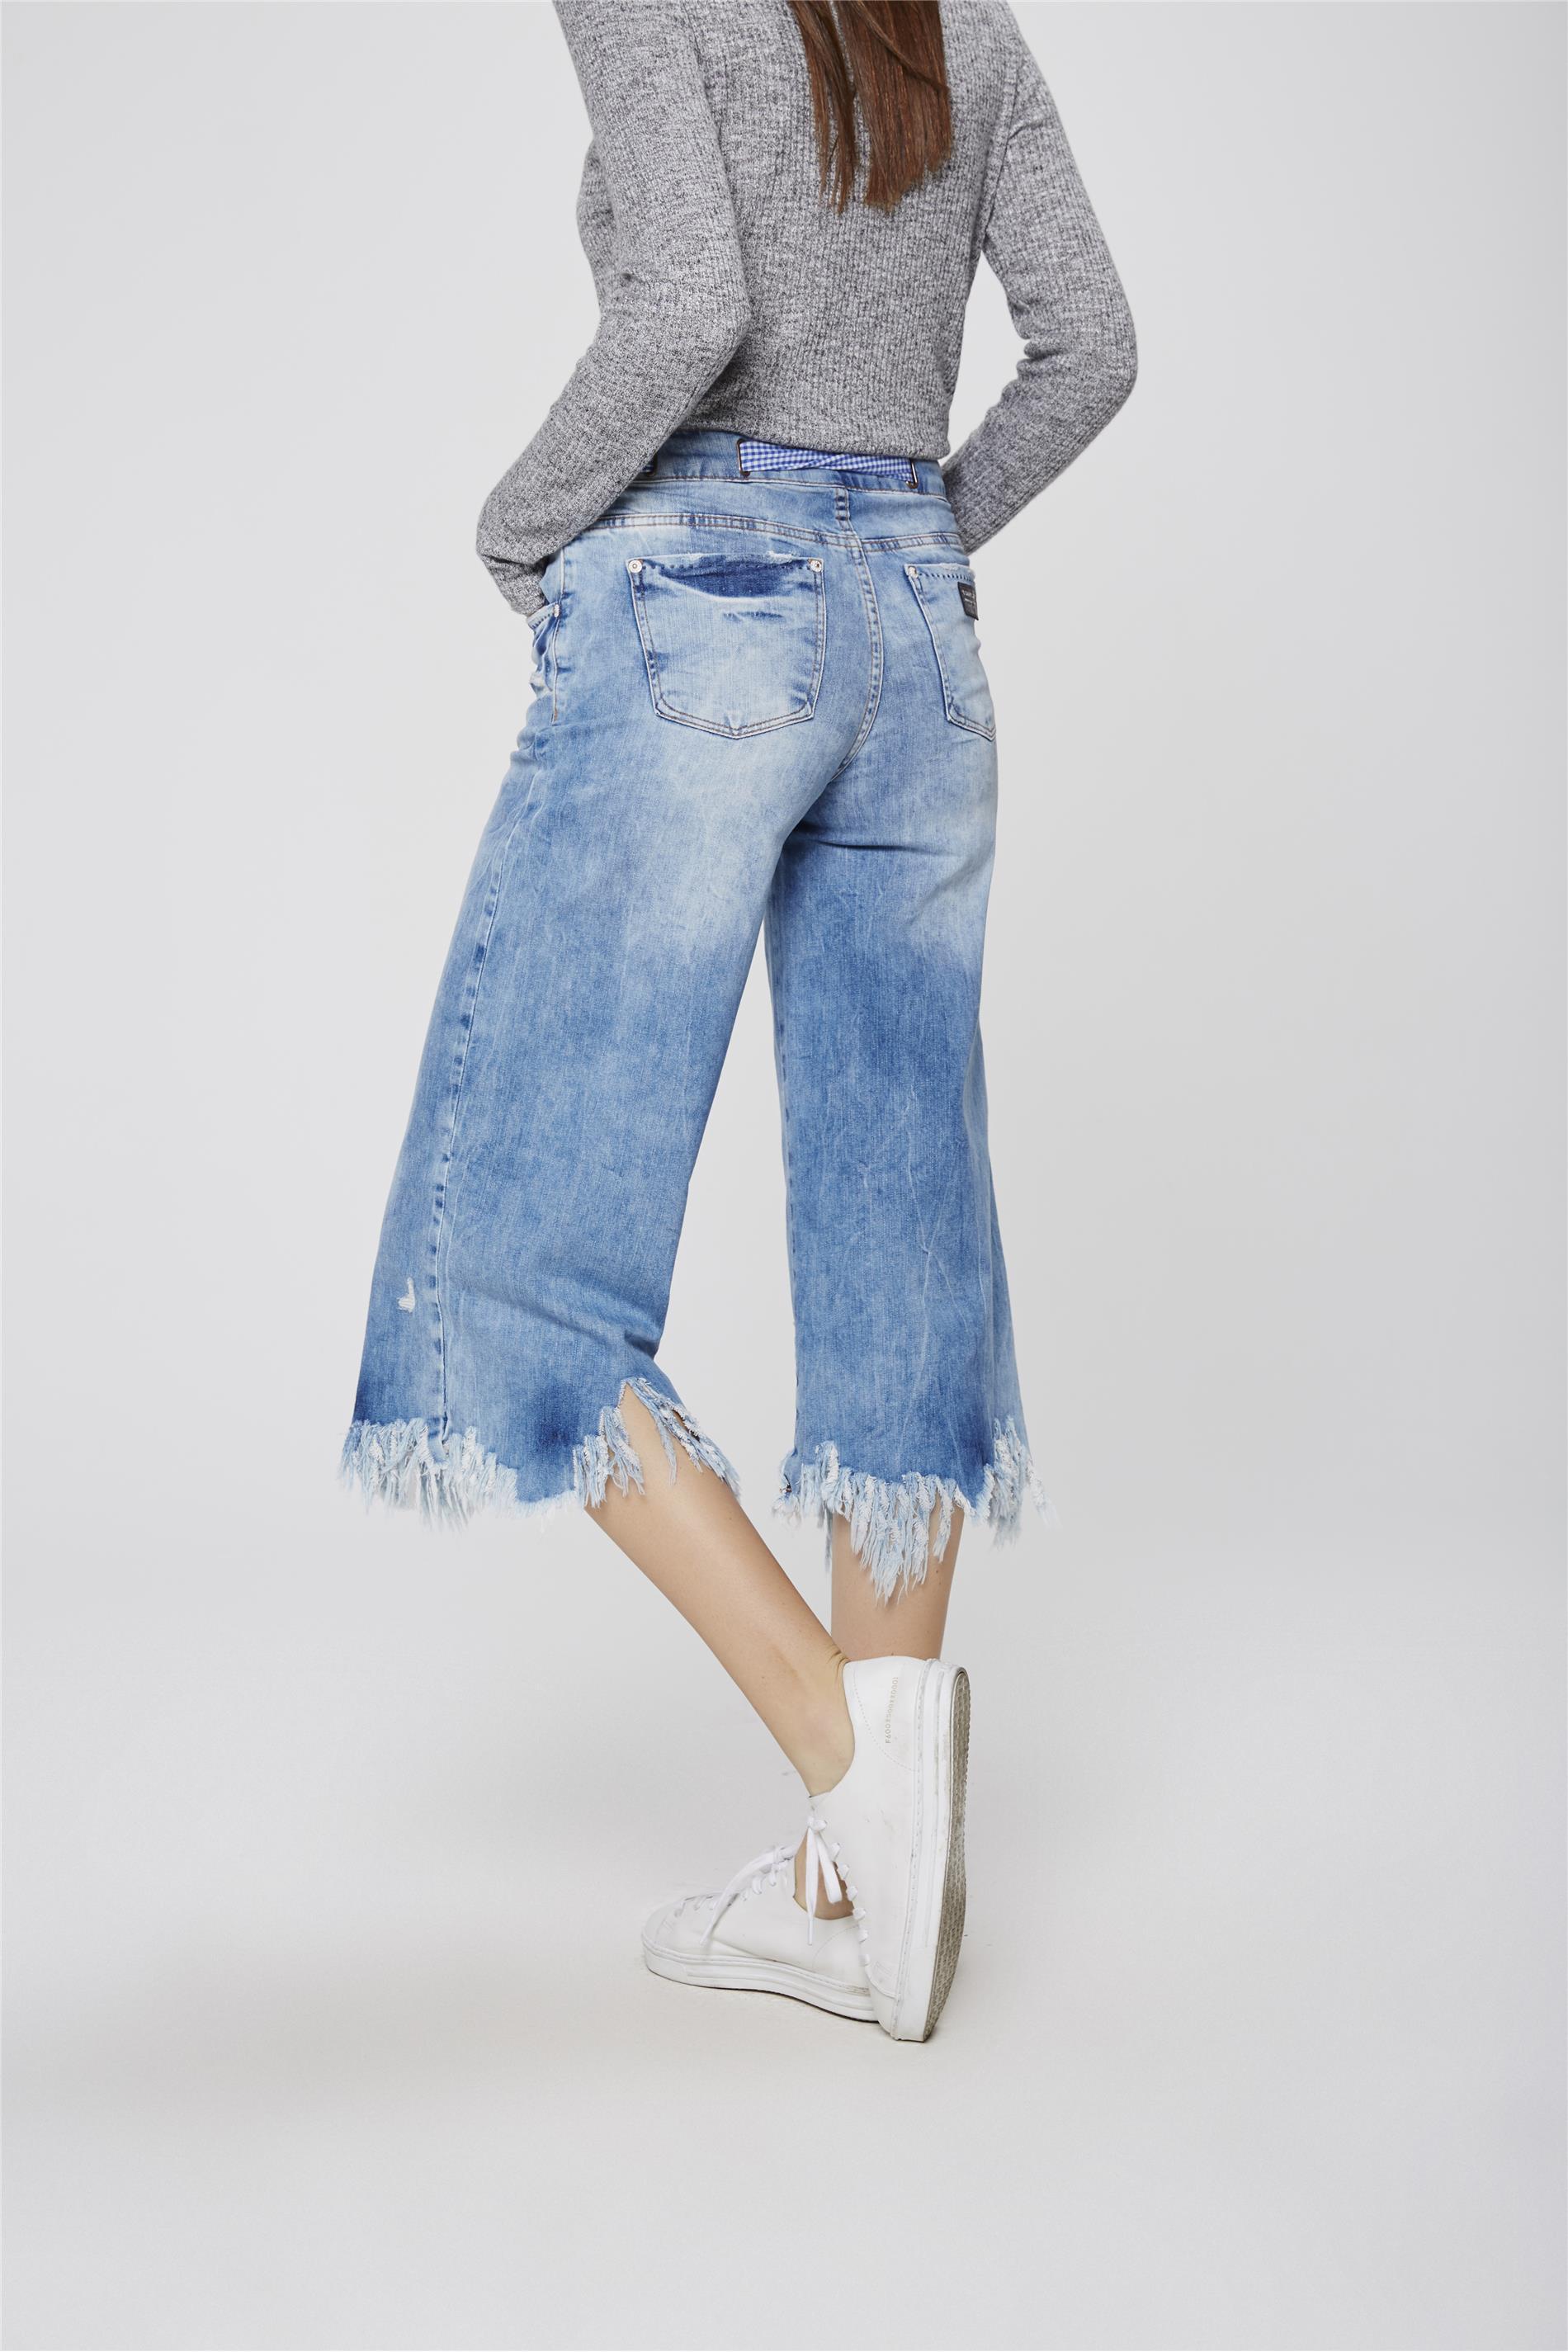 9c8892930 Pantacourt Jeans Destroyed com Lenço - Damyller